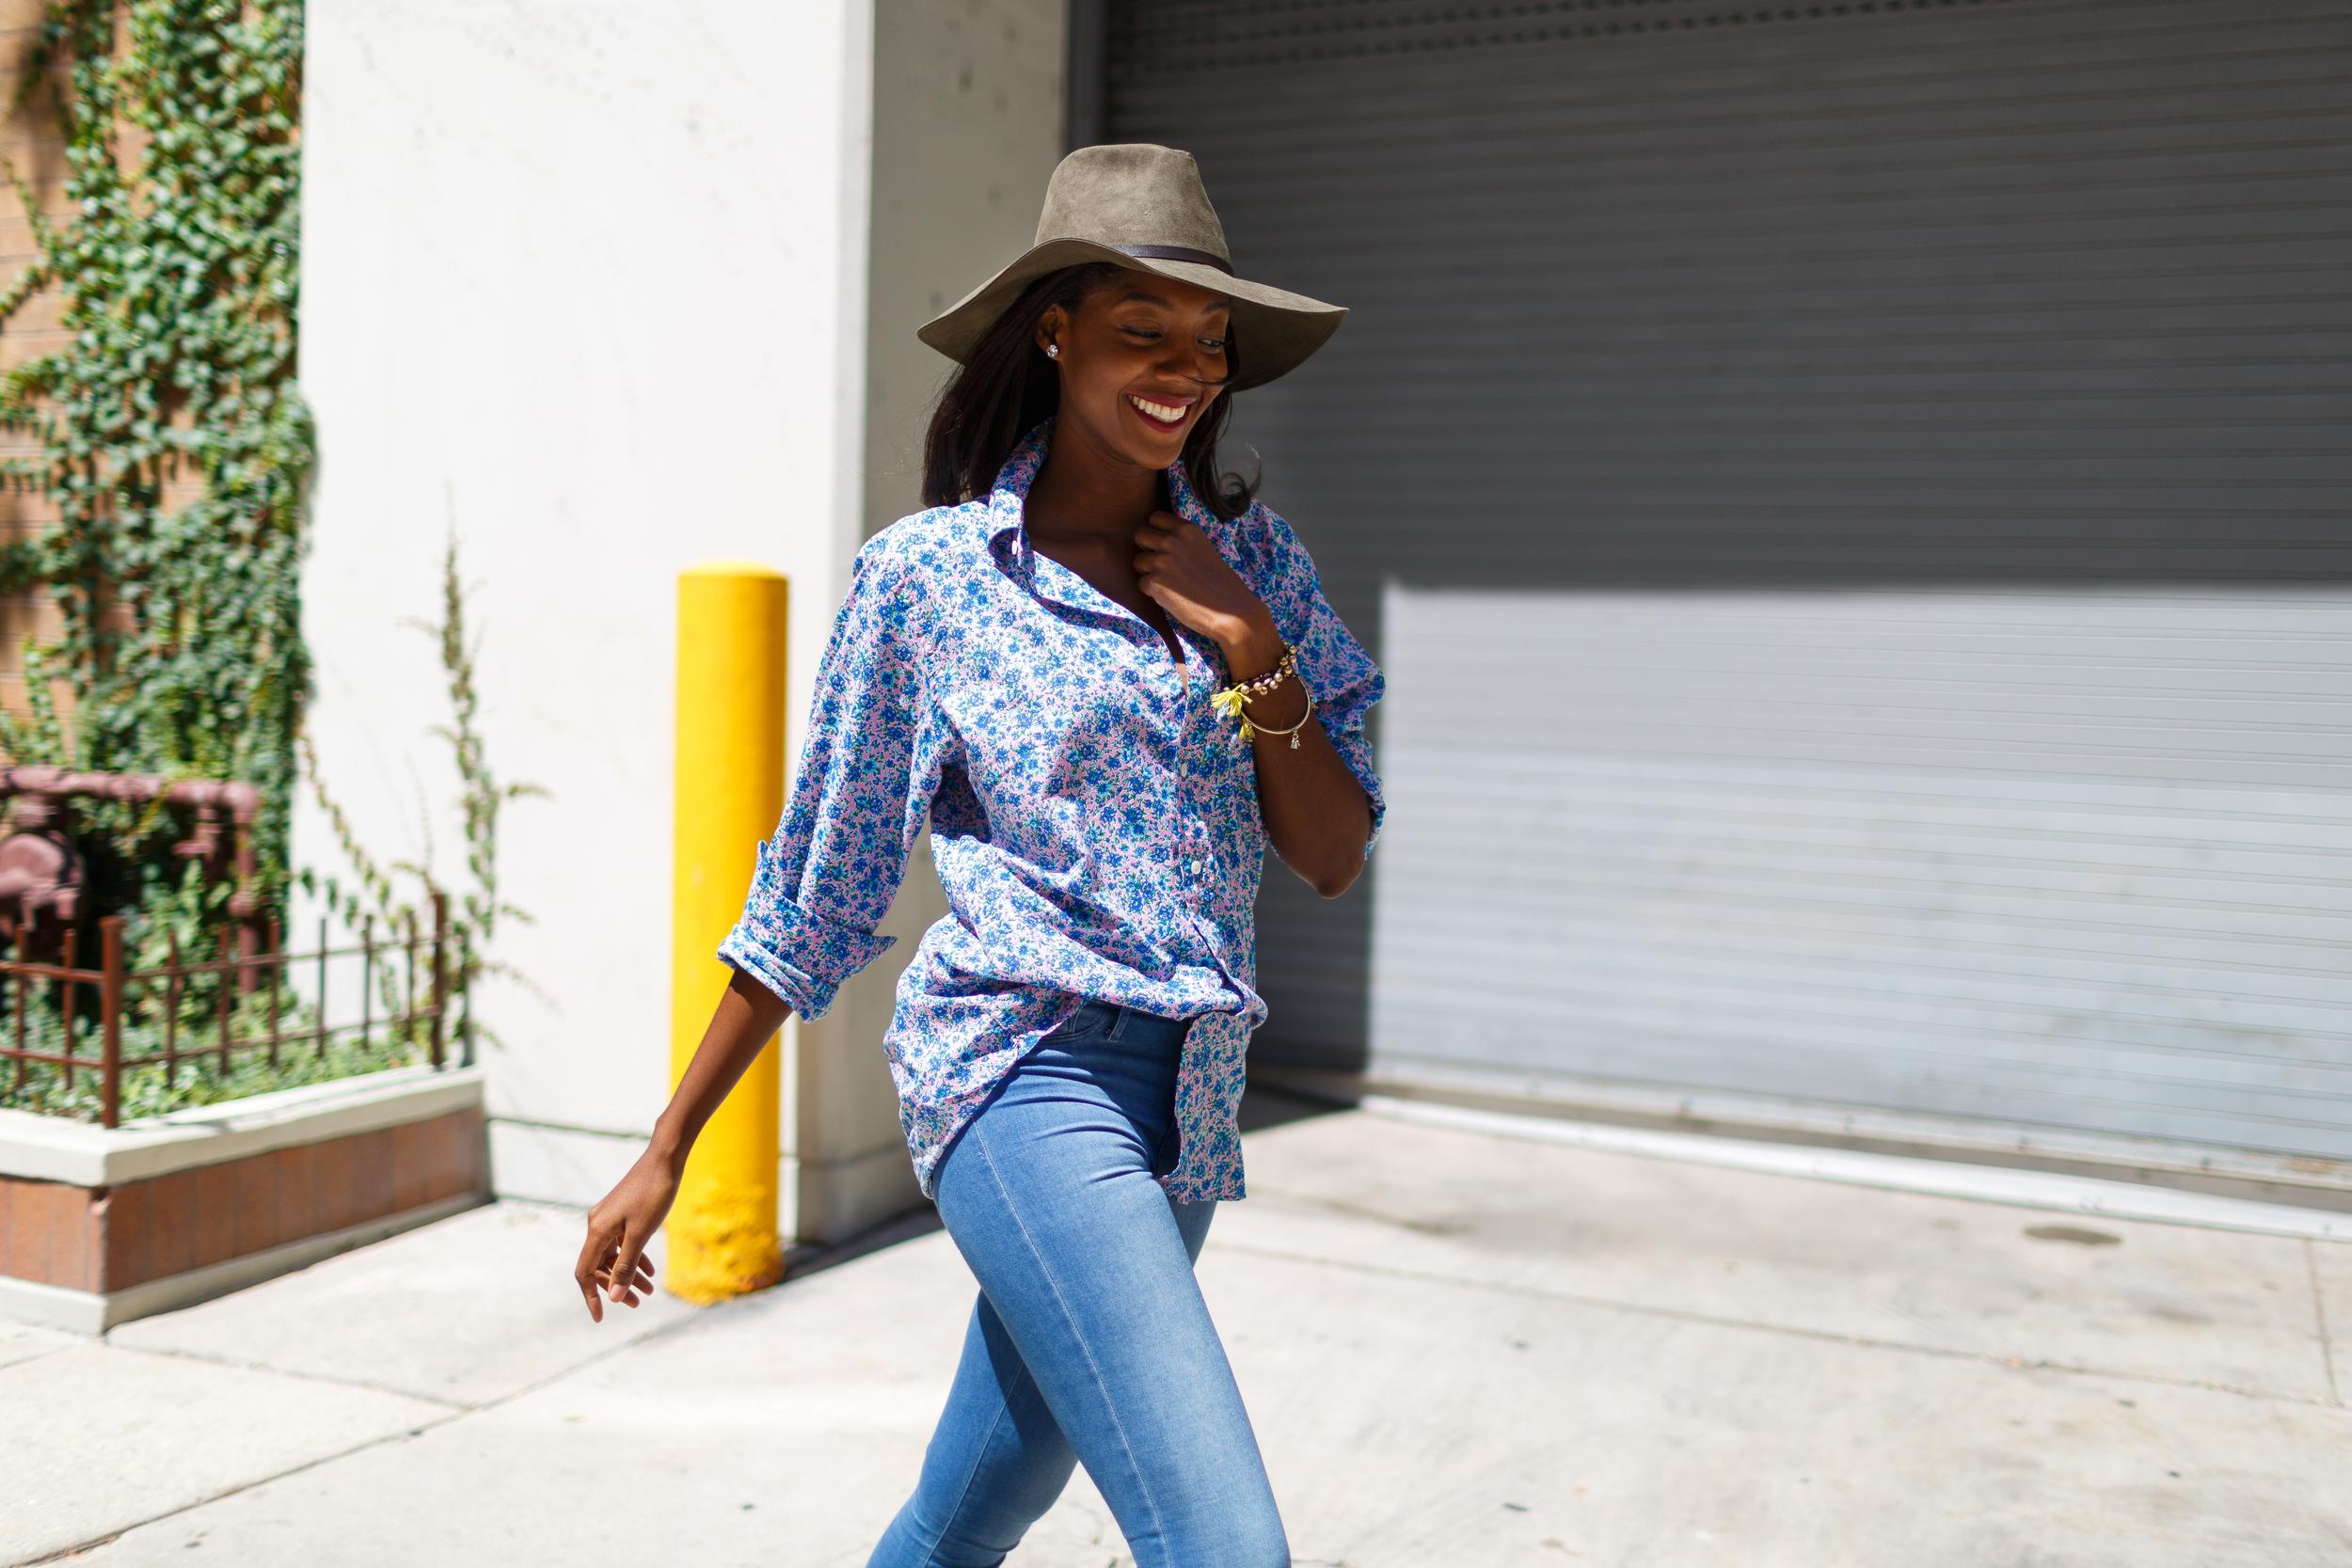 Afua Rida Styled By Rida Ghana Fashion Blogger African Blogger Polo Boyfriend shirt Louboutin top Shop Zara Hat Chicago Downtown Infrusture  Fashion Stylist African Blogger 1.jpg